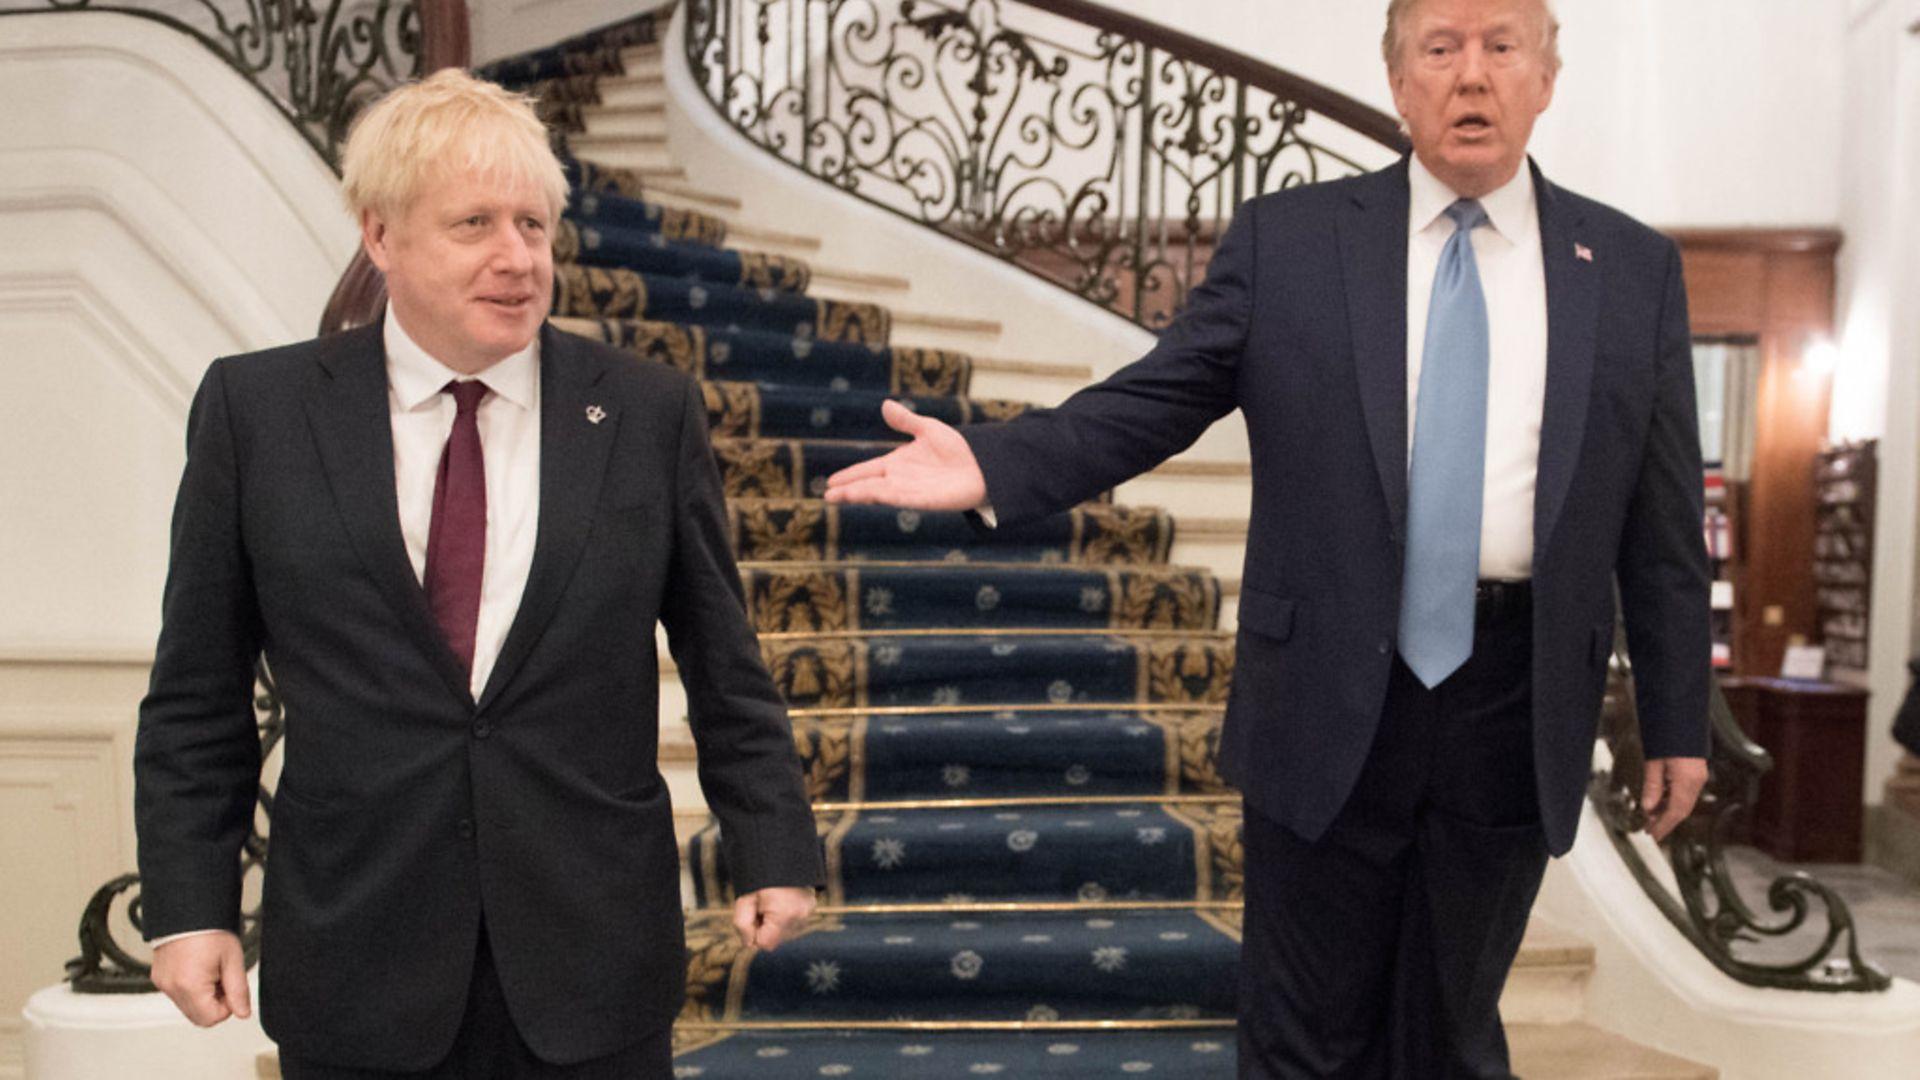 Boris Johnson meeting US President Donald Trump for bilateral talks - Credit: Stefan Rousseau/PA Wire